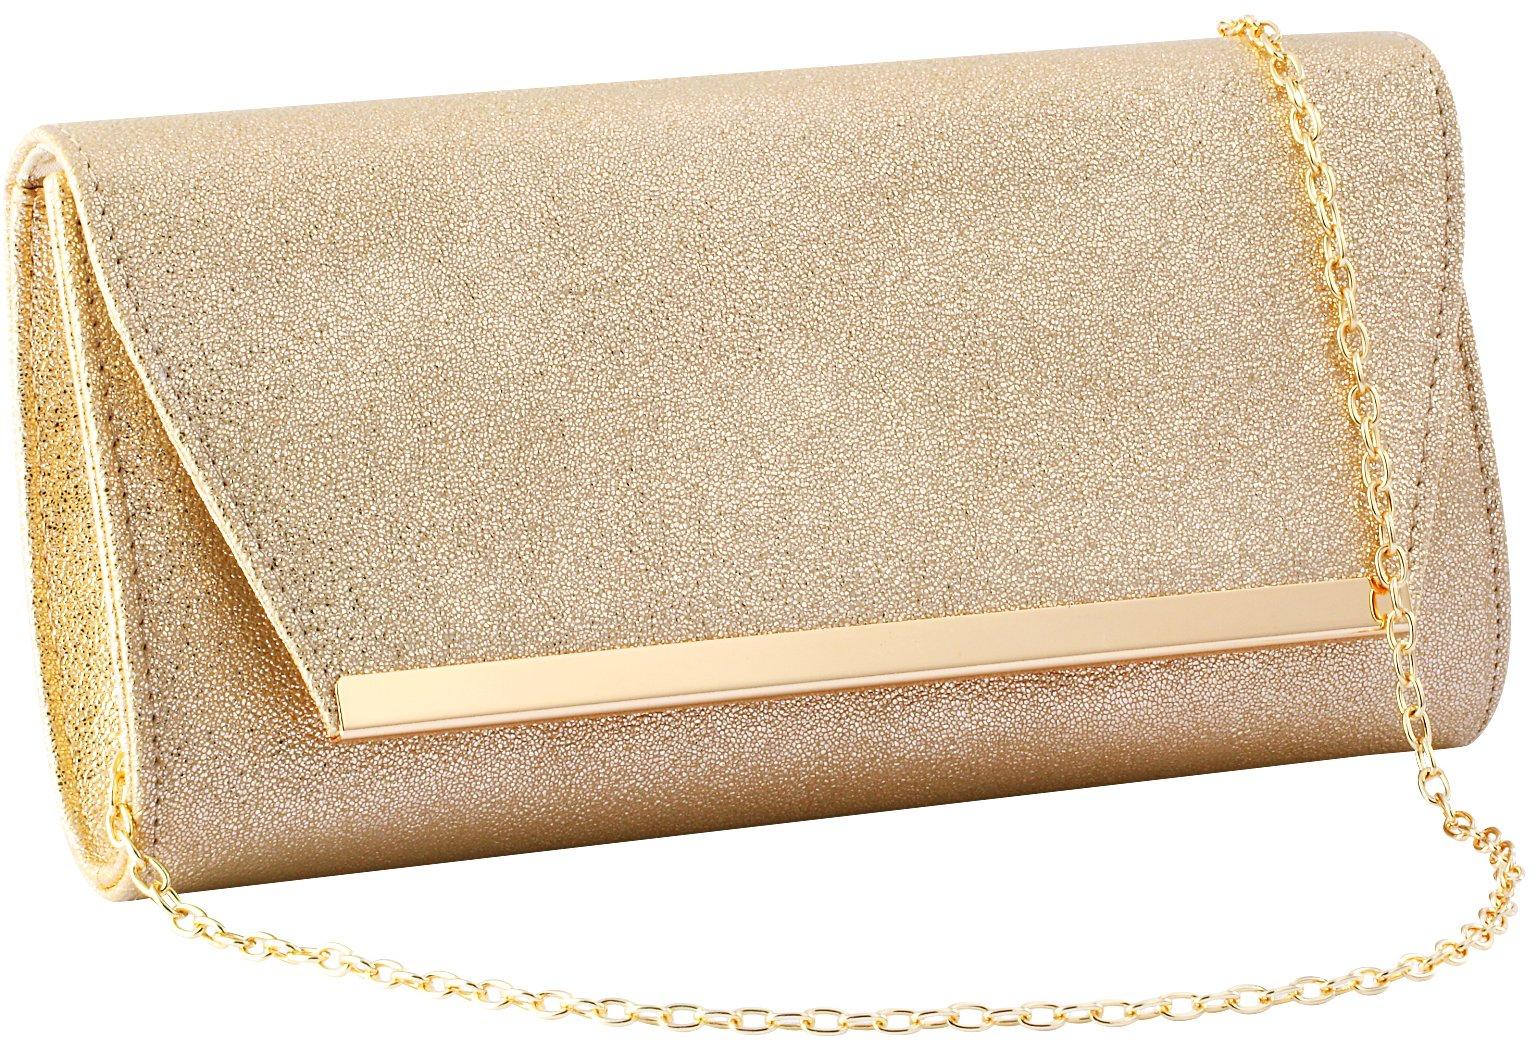 Women Evening Party Clutch Bags Handbag Bridal Wedding Purse (GOLD C)